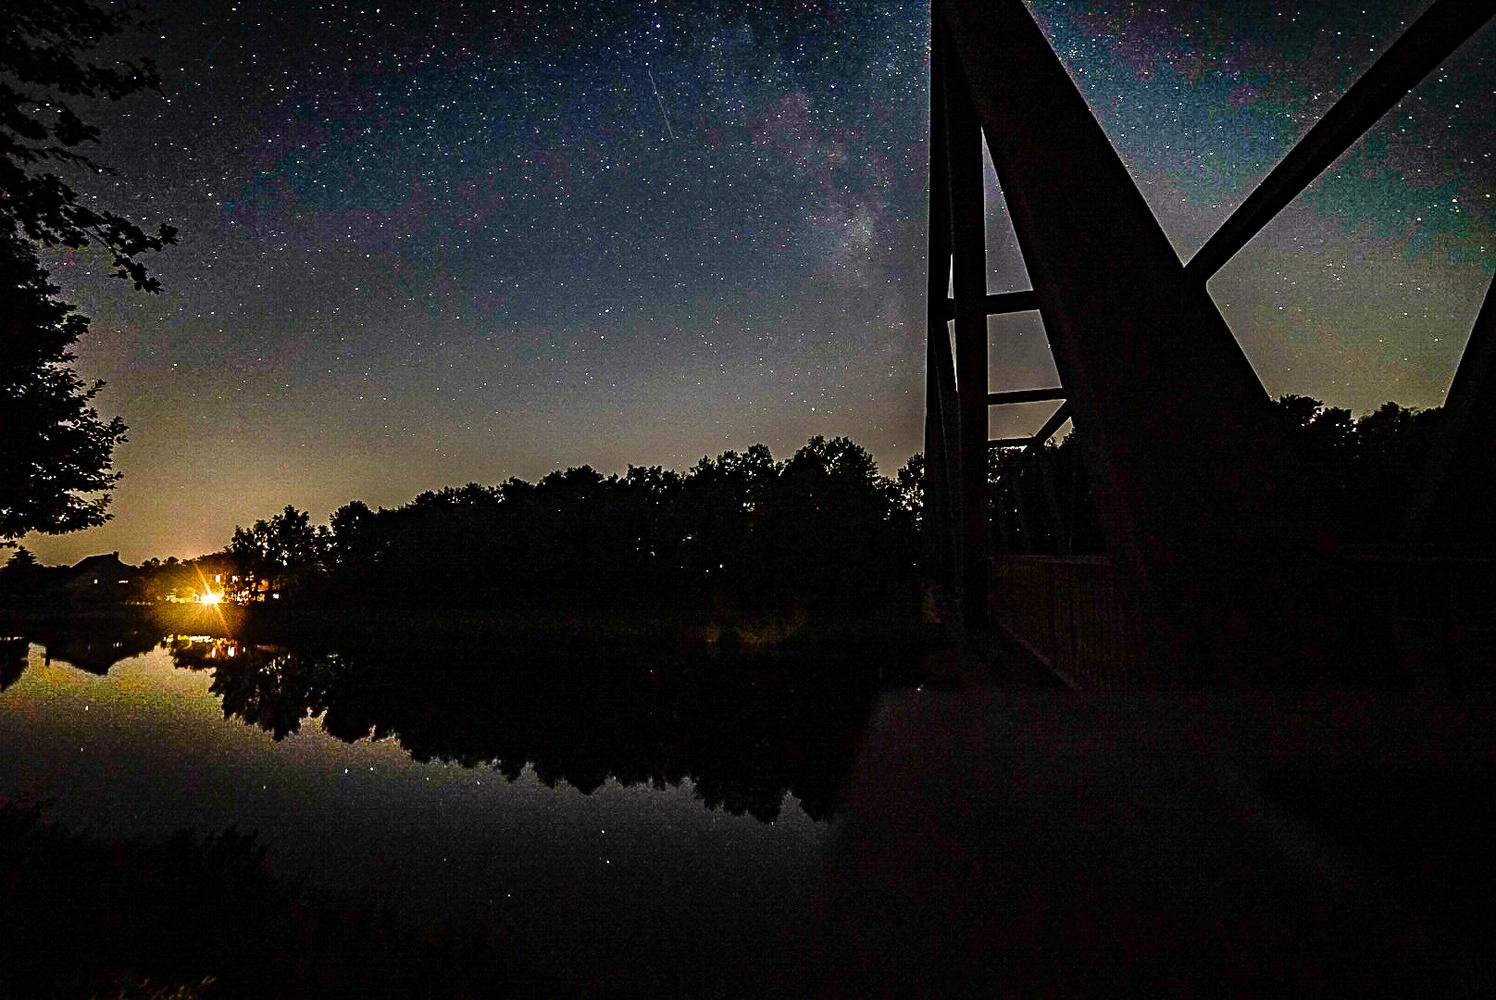 Night Time at Mittellandkanal by Sebastian Dannenberg